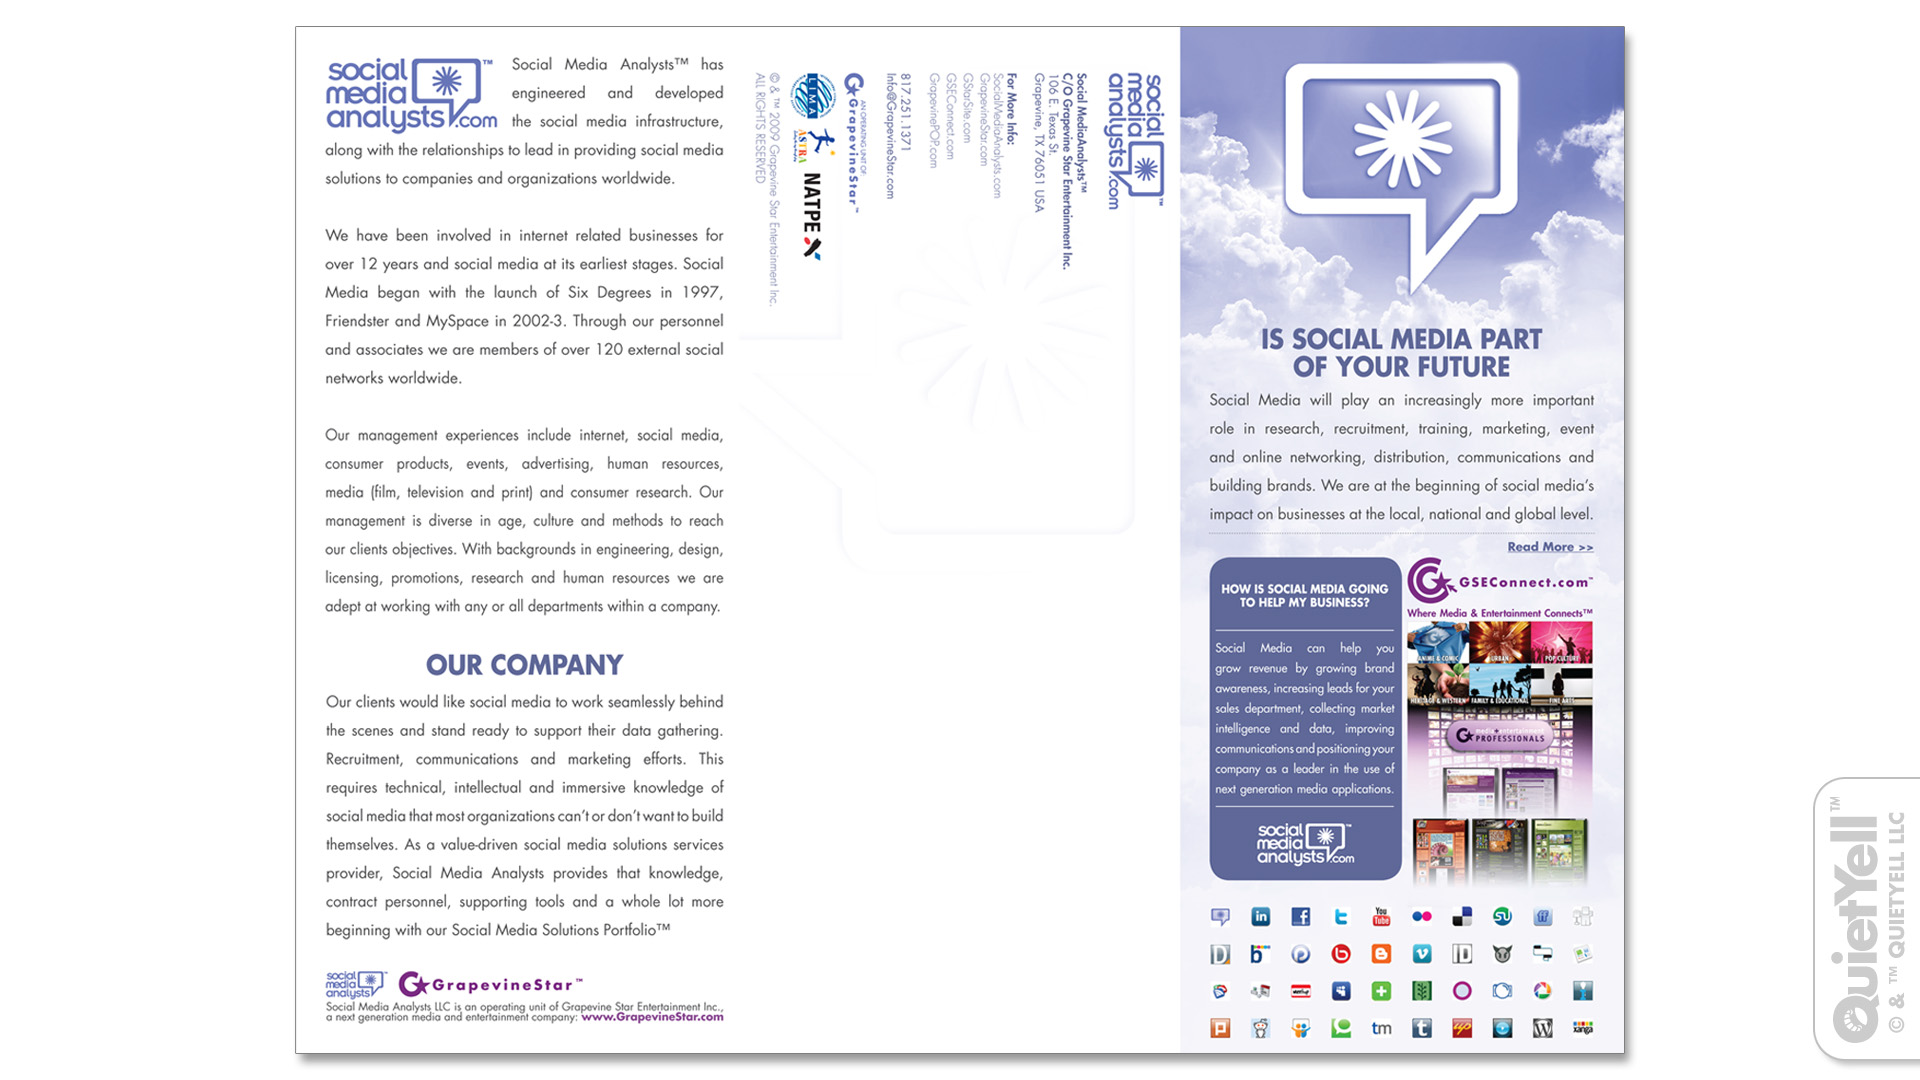 quietyell_design_details_socialmediaanalysts_trifold_1_01